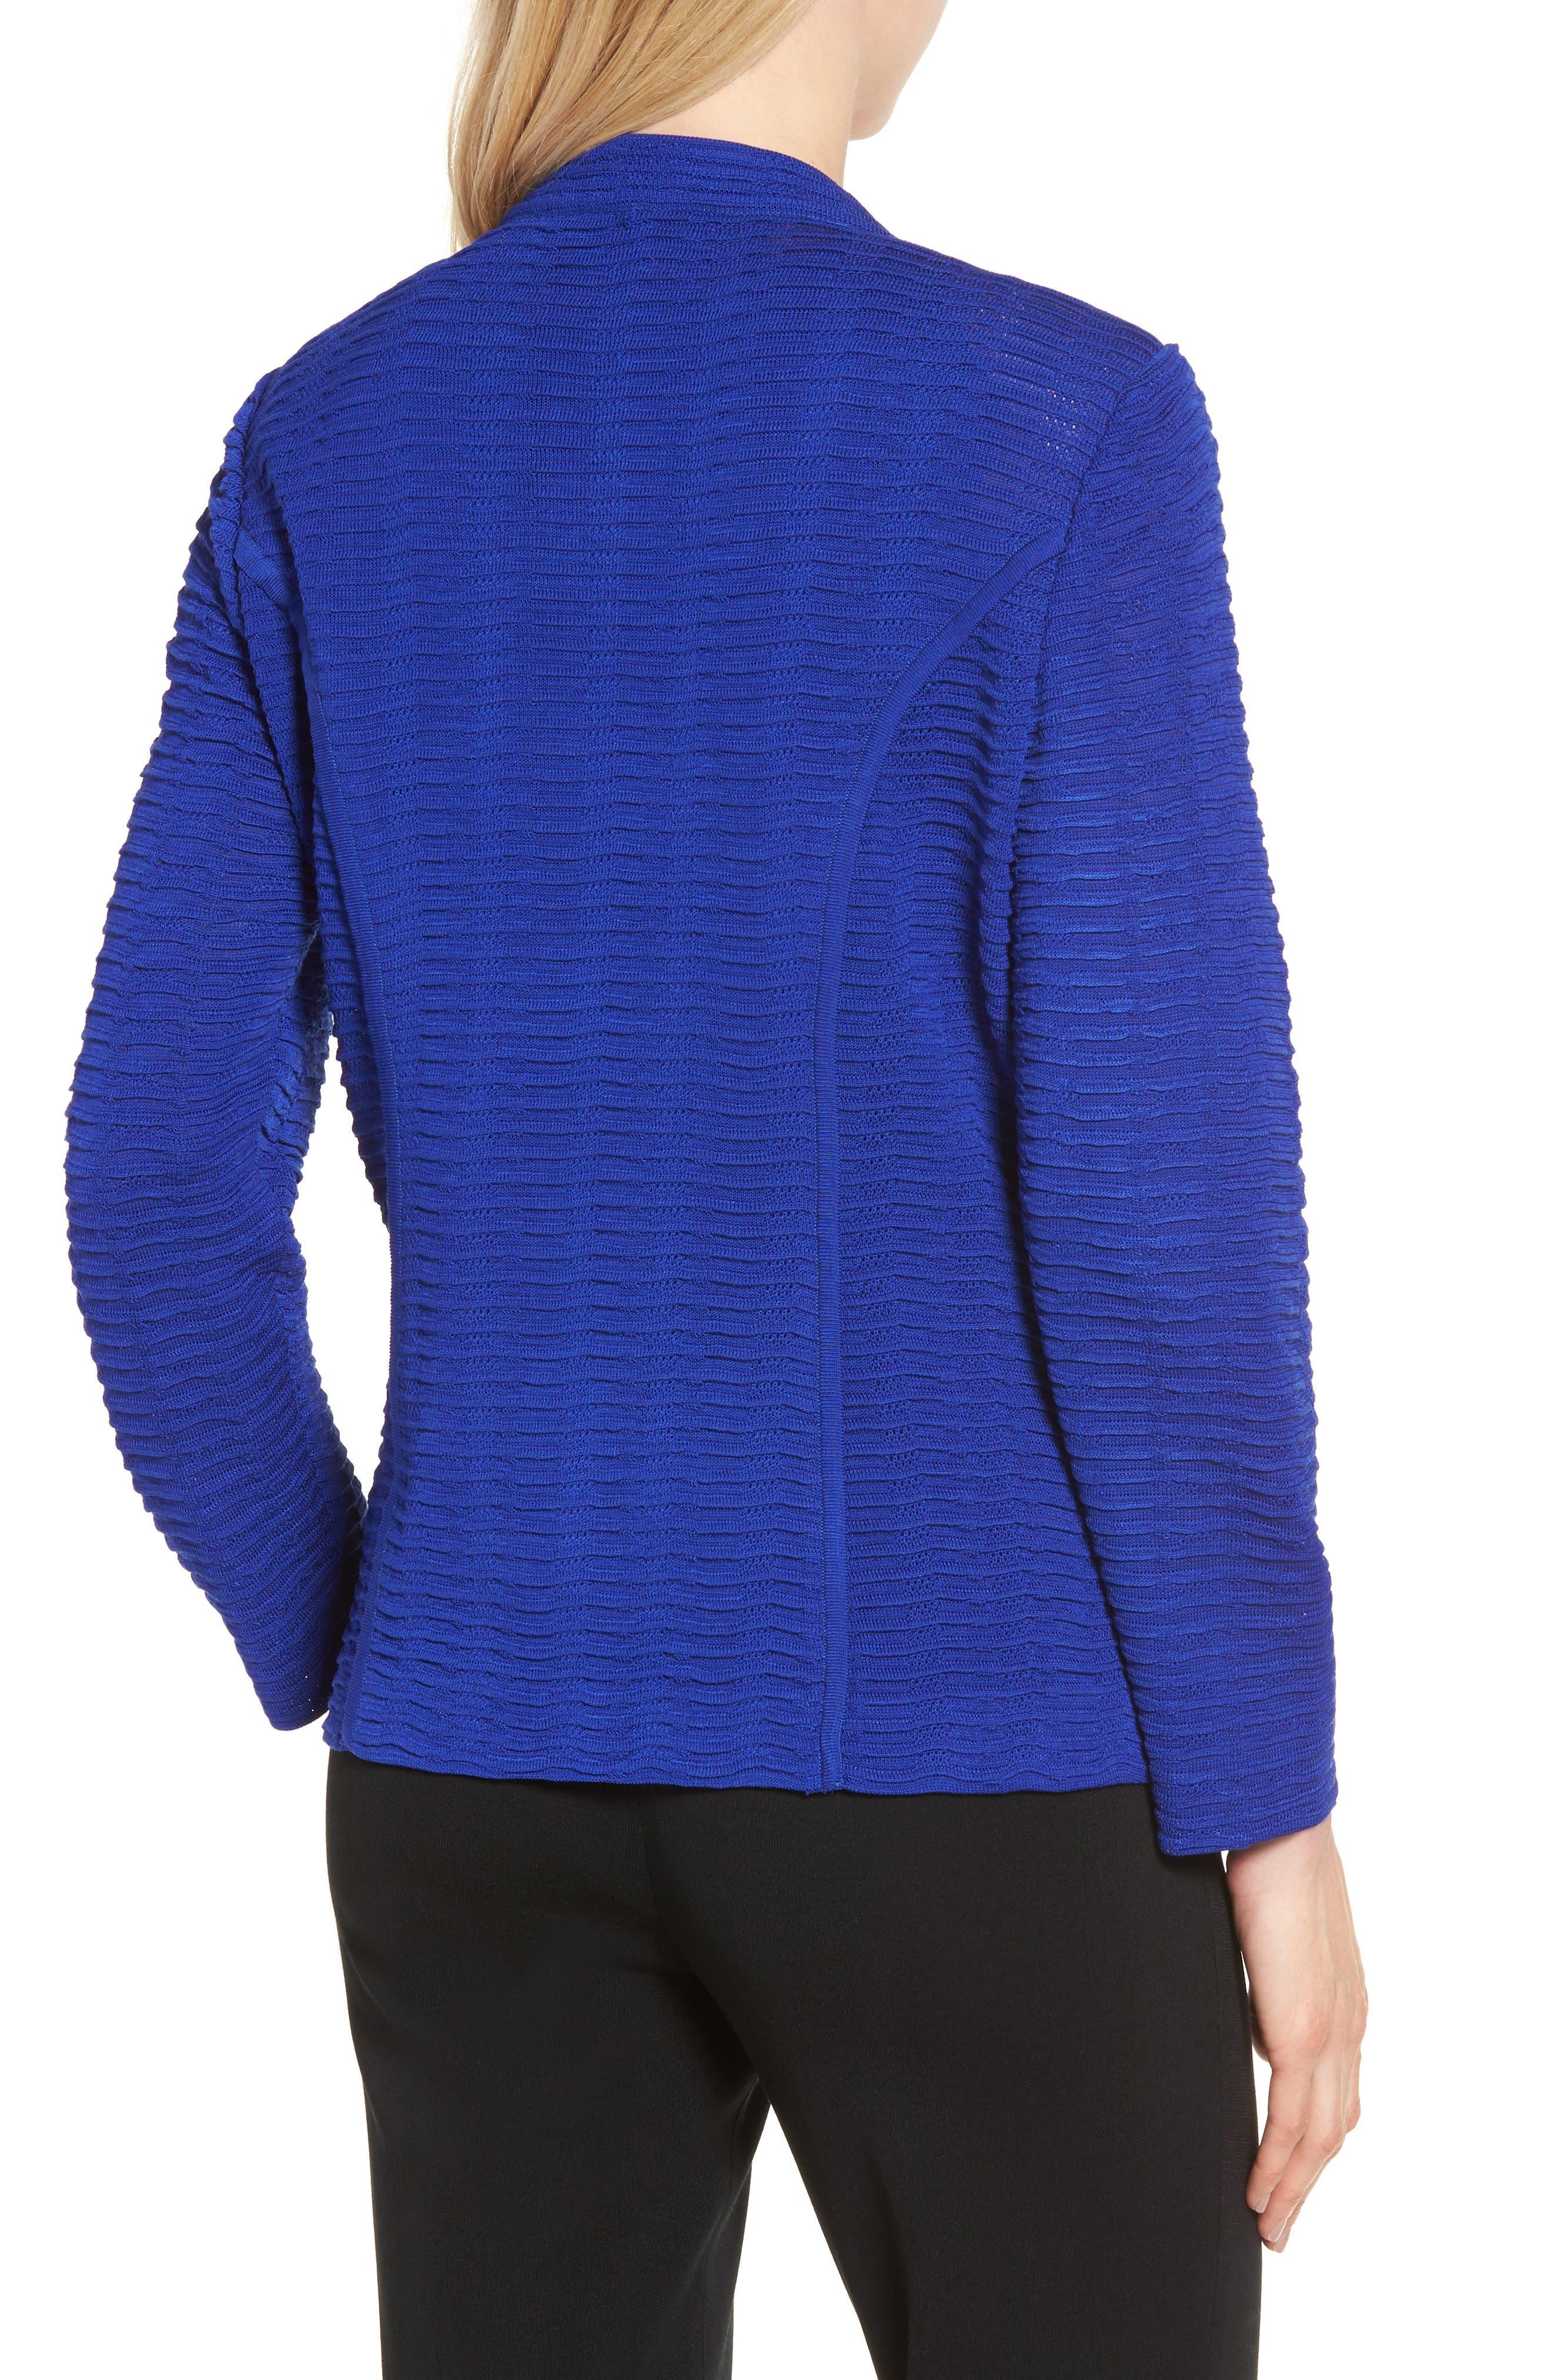 Ripple Knit Jacket,                             Alternate thumbnail 2, color,